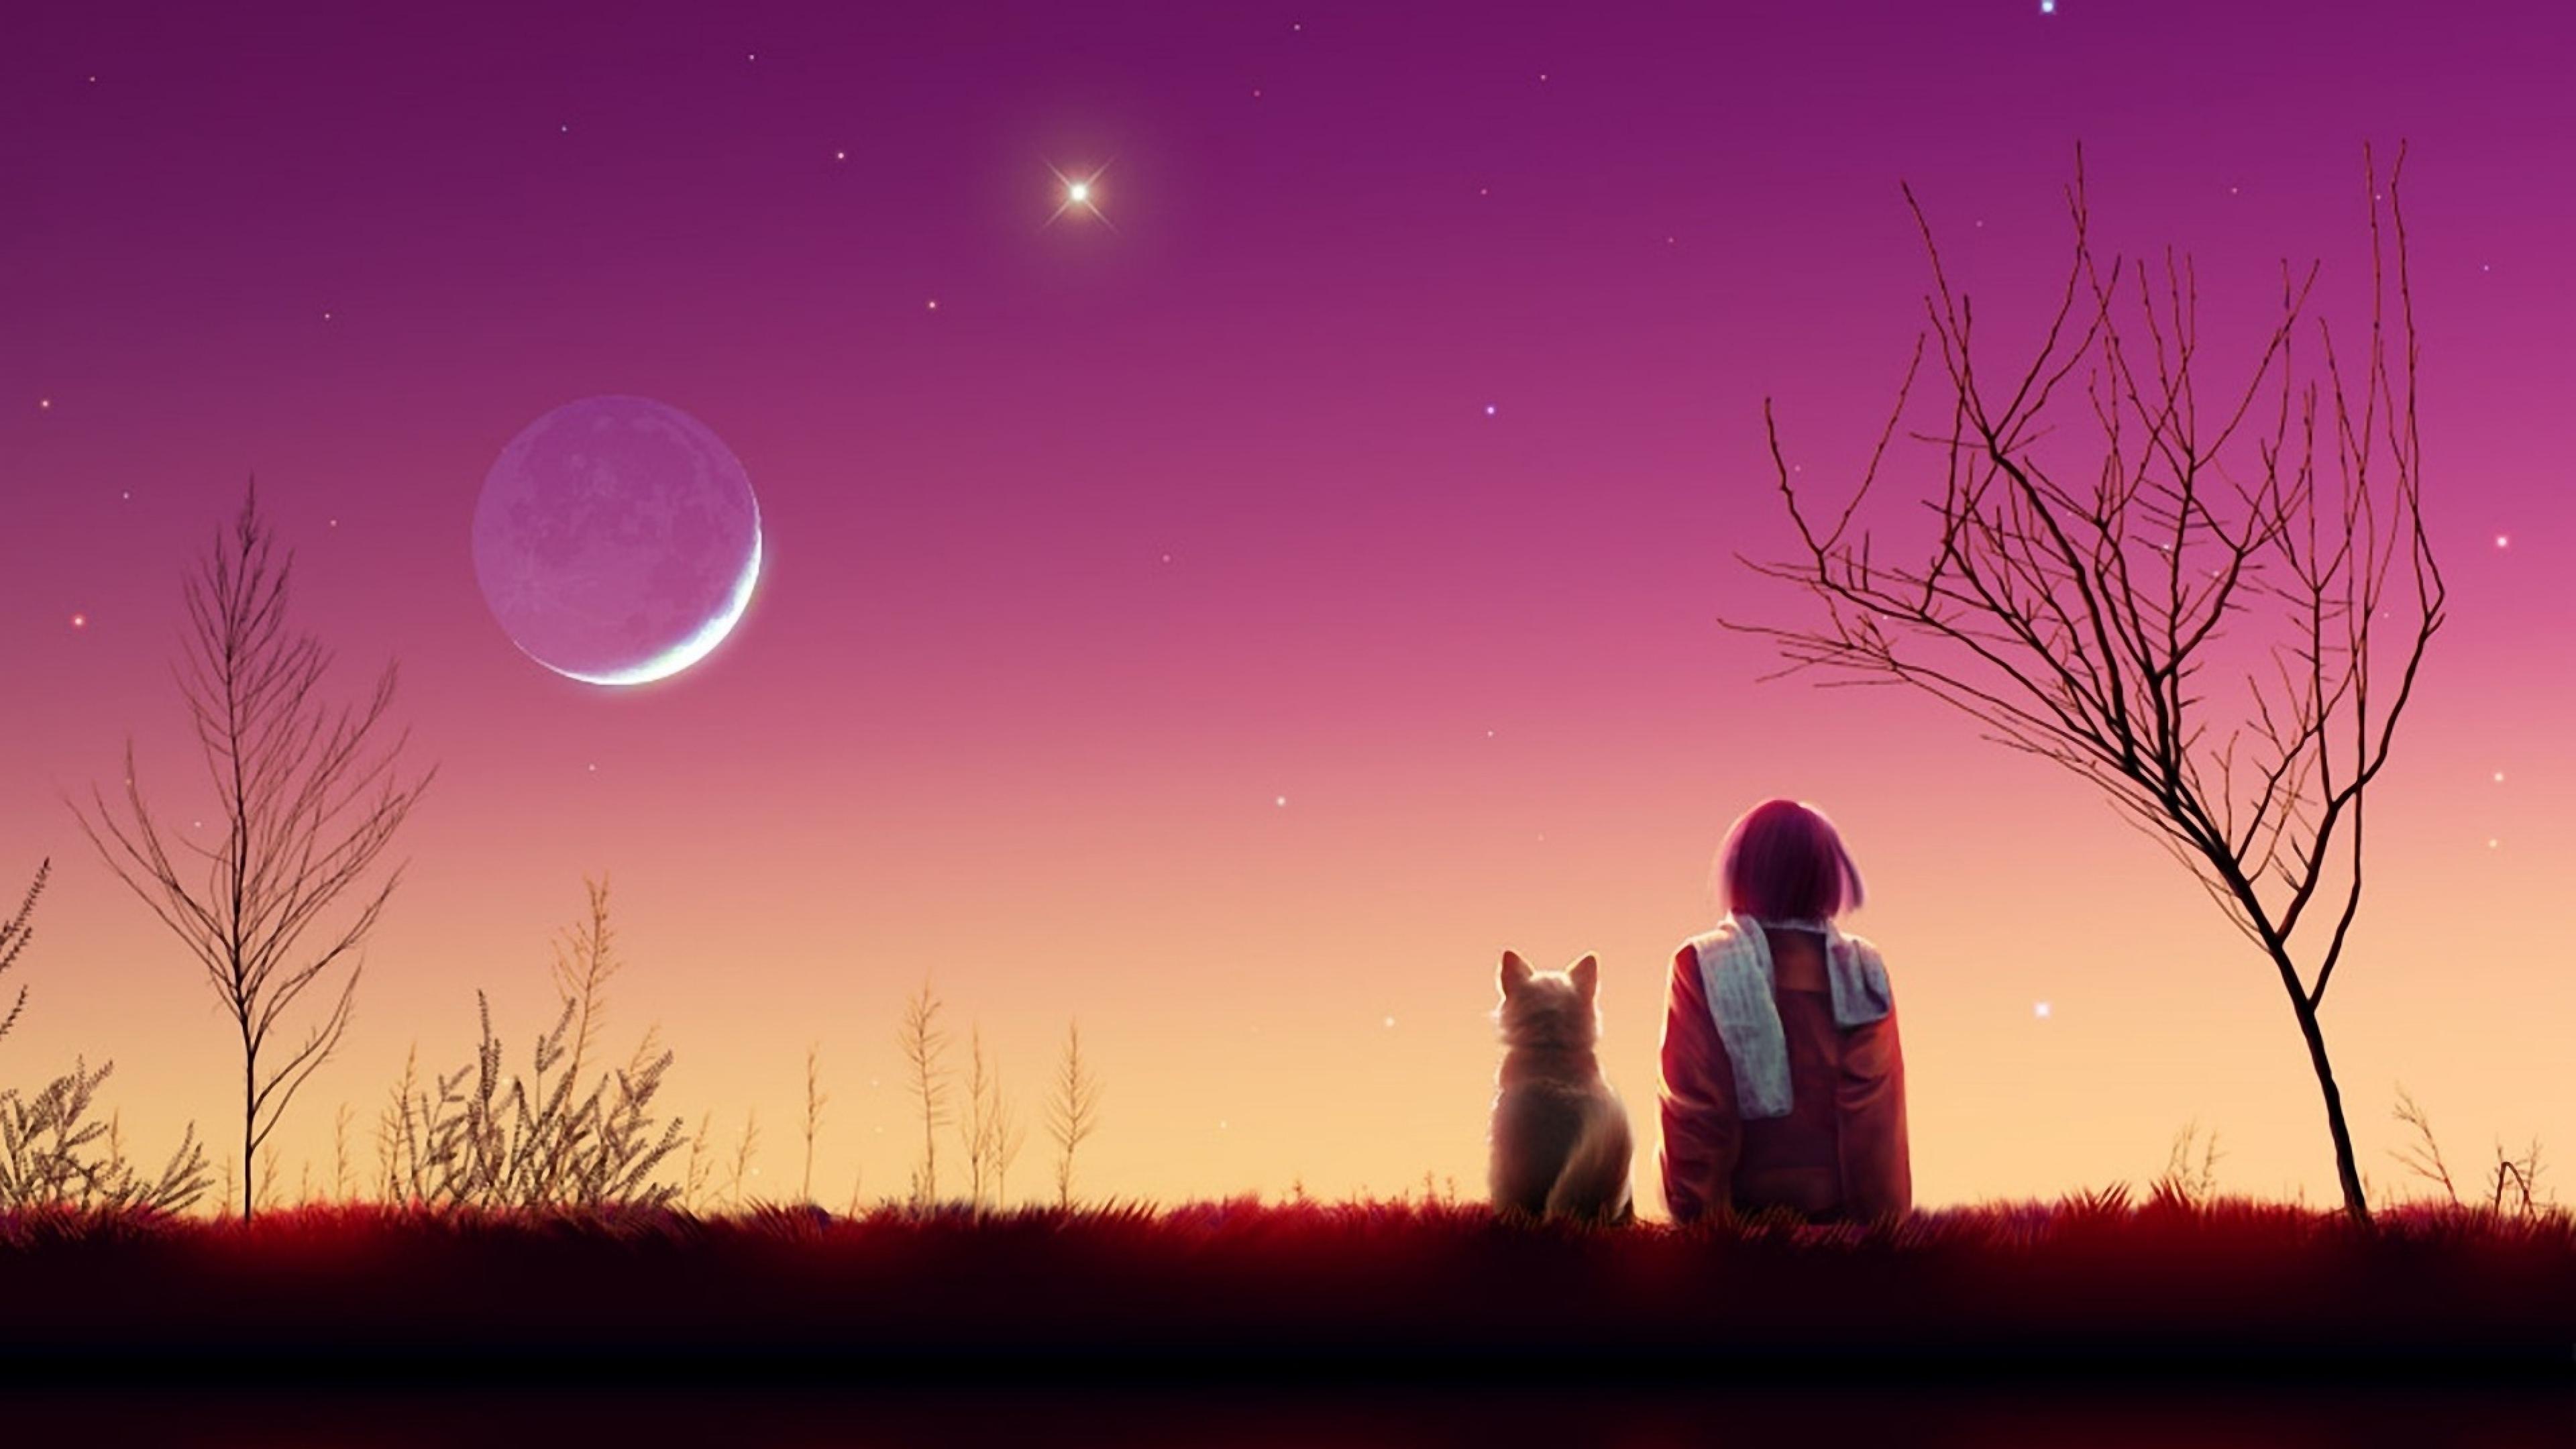 Anime Girl Sunset, HD Anime, 4k Wallpapers, Images ...